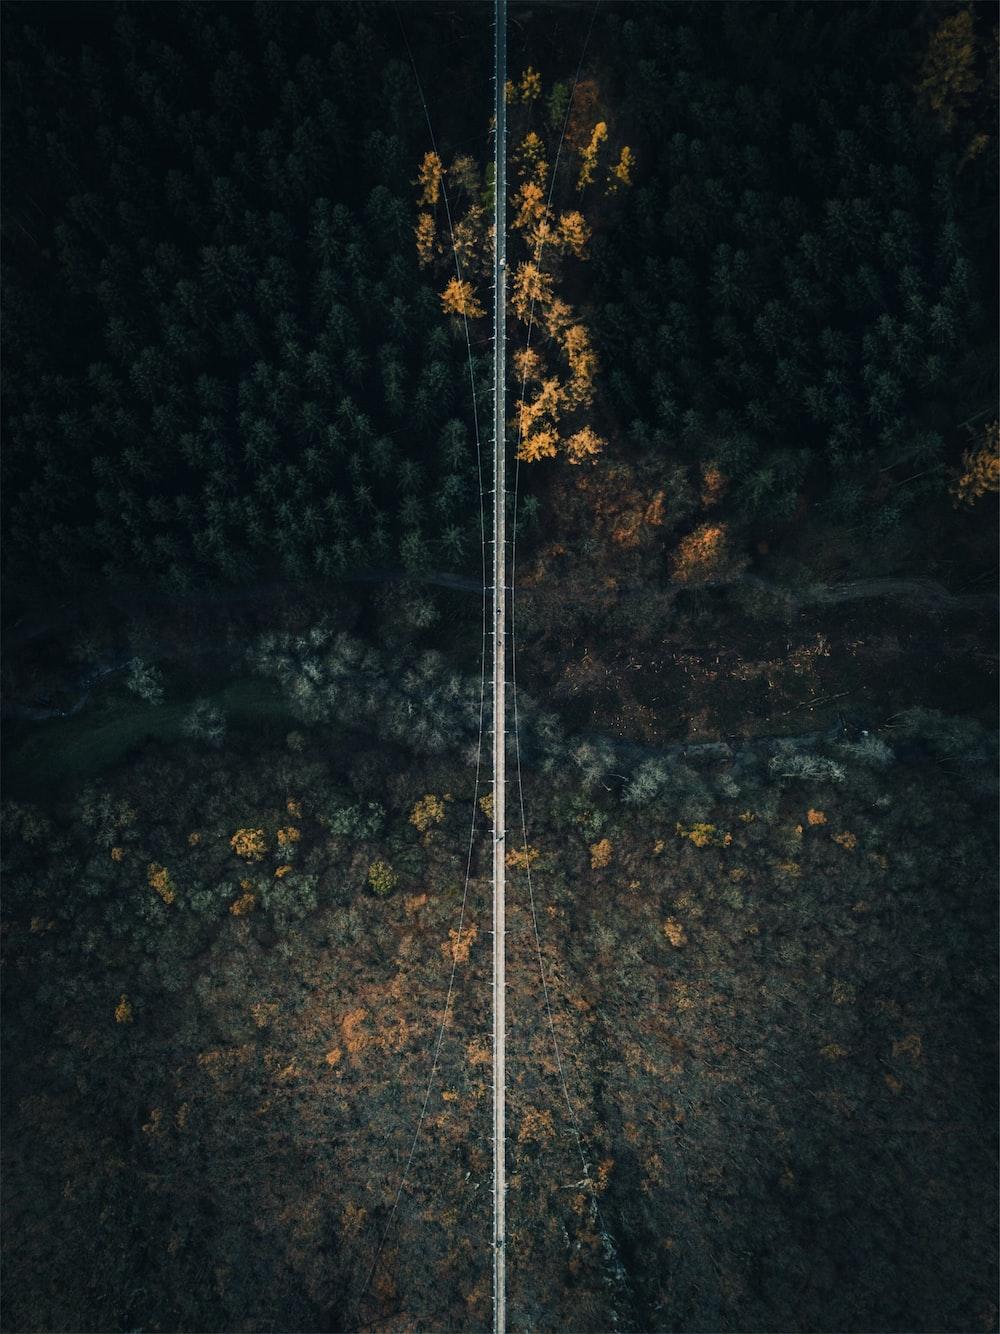 aerial photography of bridge between trees